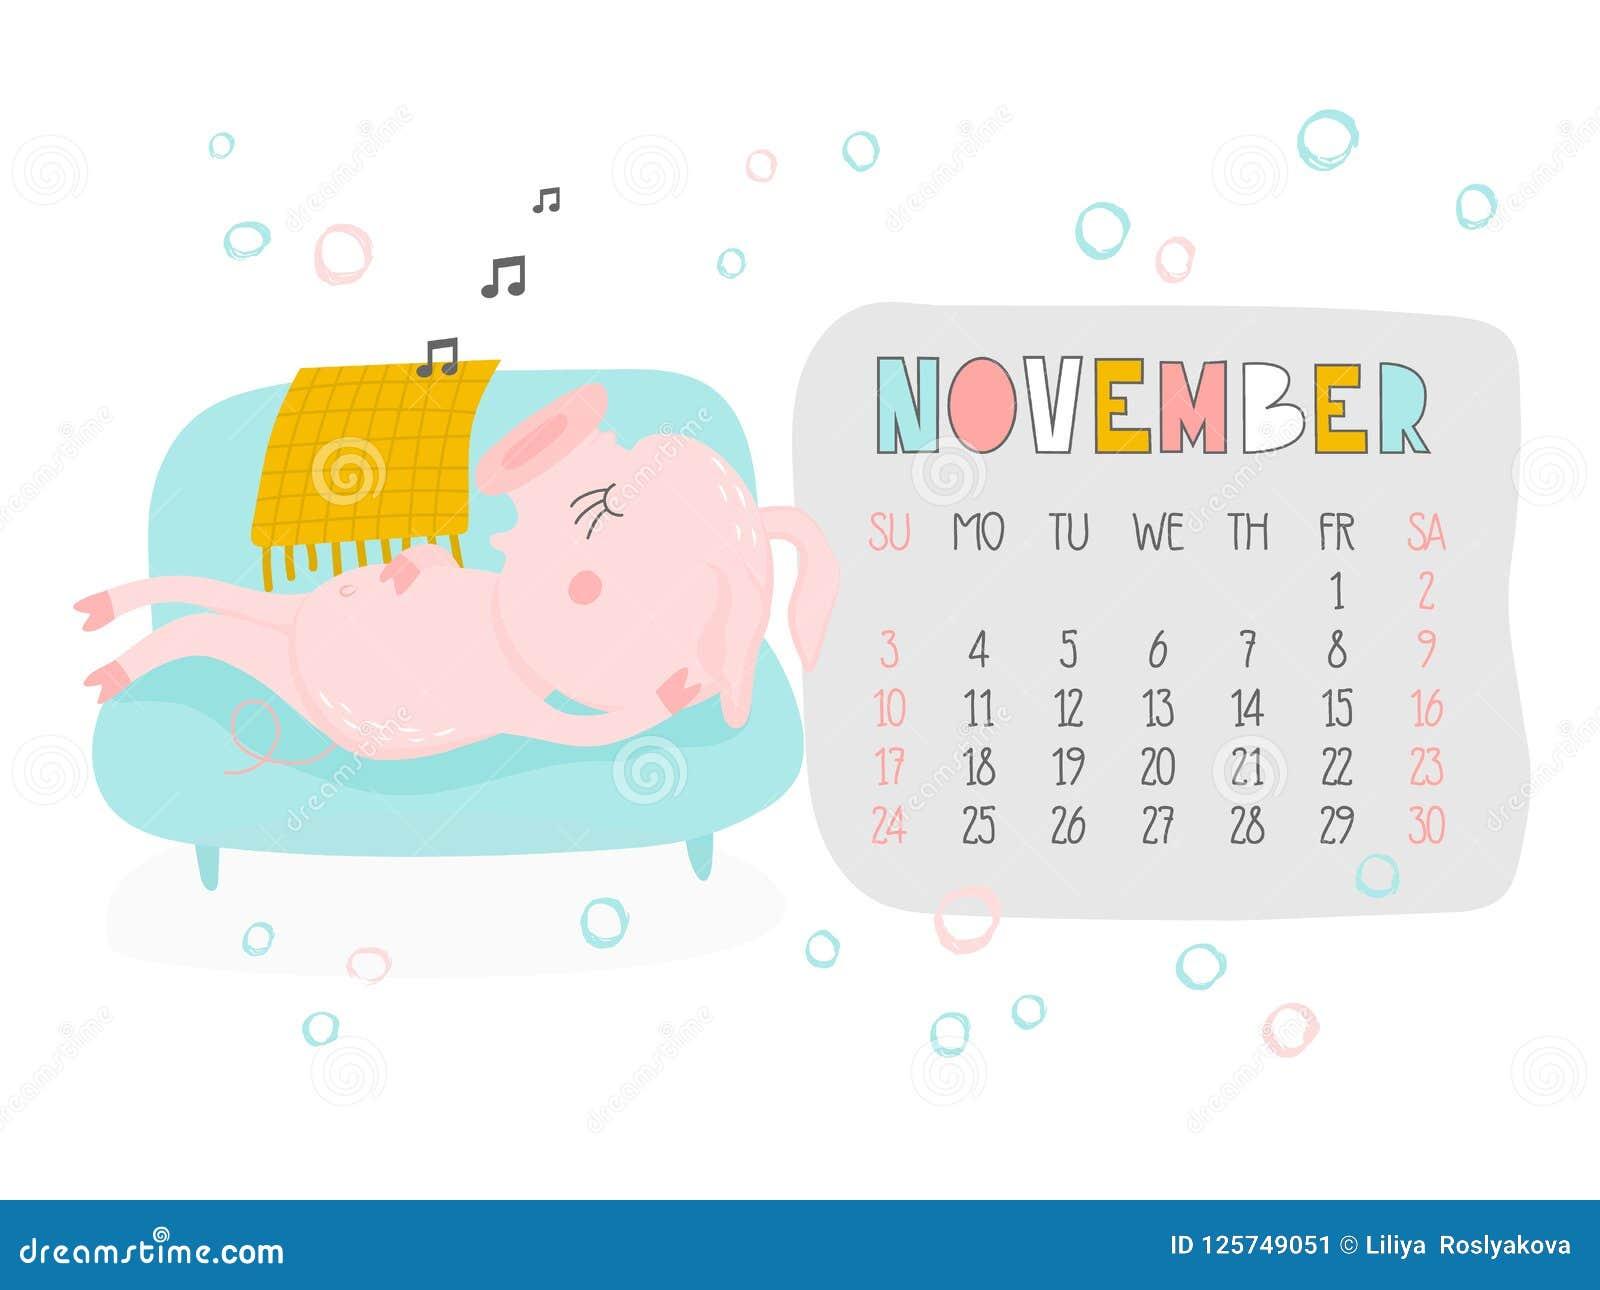 Creative Calendar For November 2019 With Cute Pig  Concept